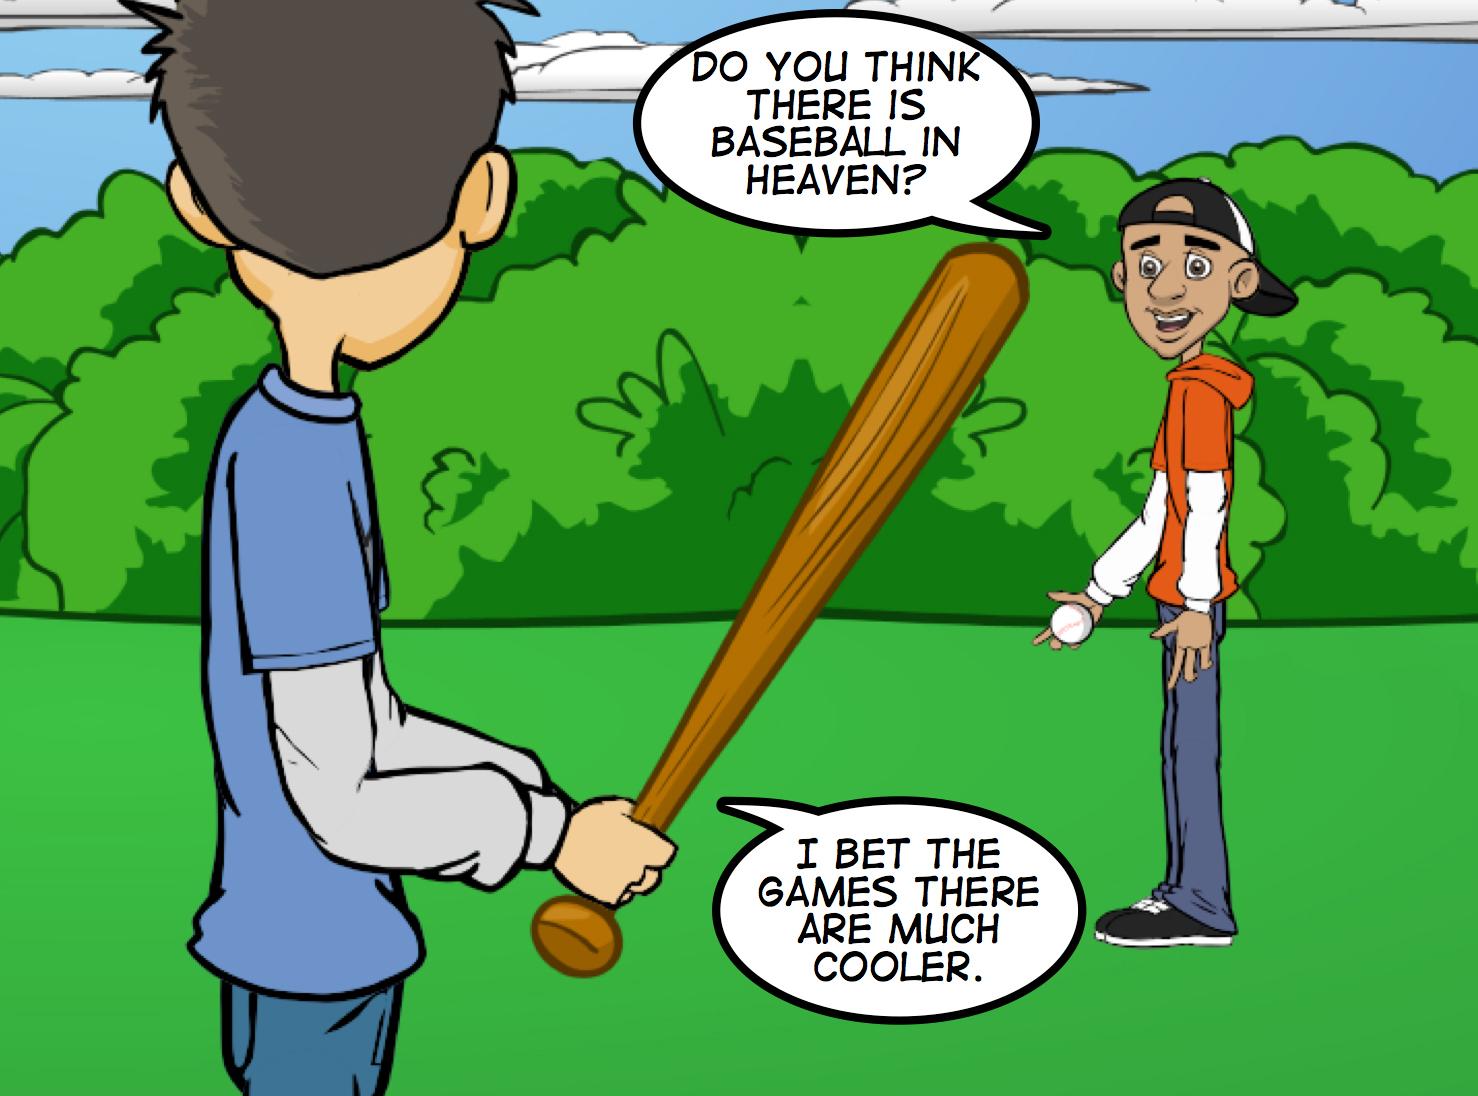 Heavenly Fun